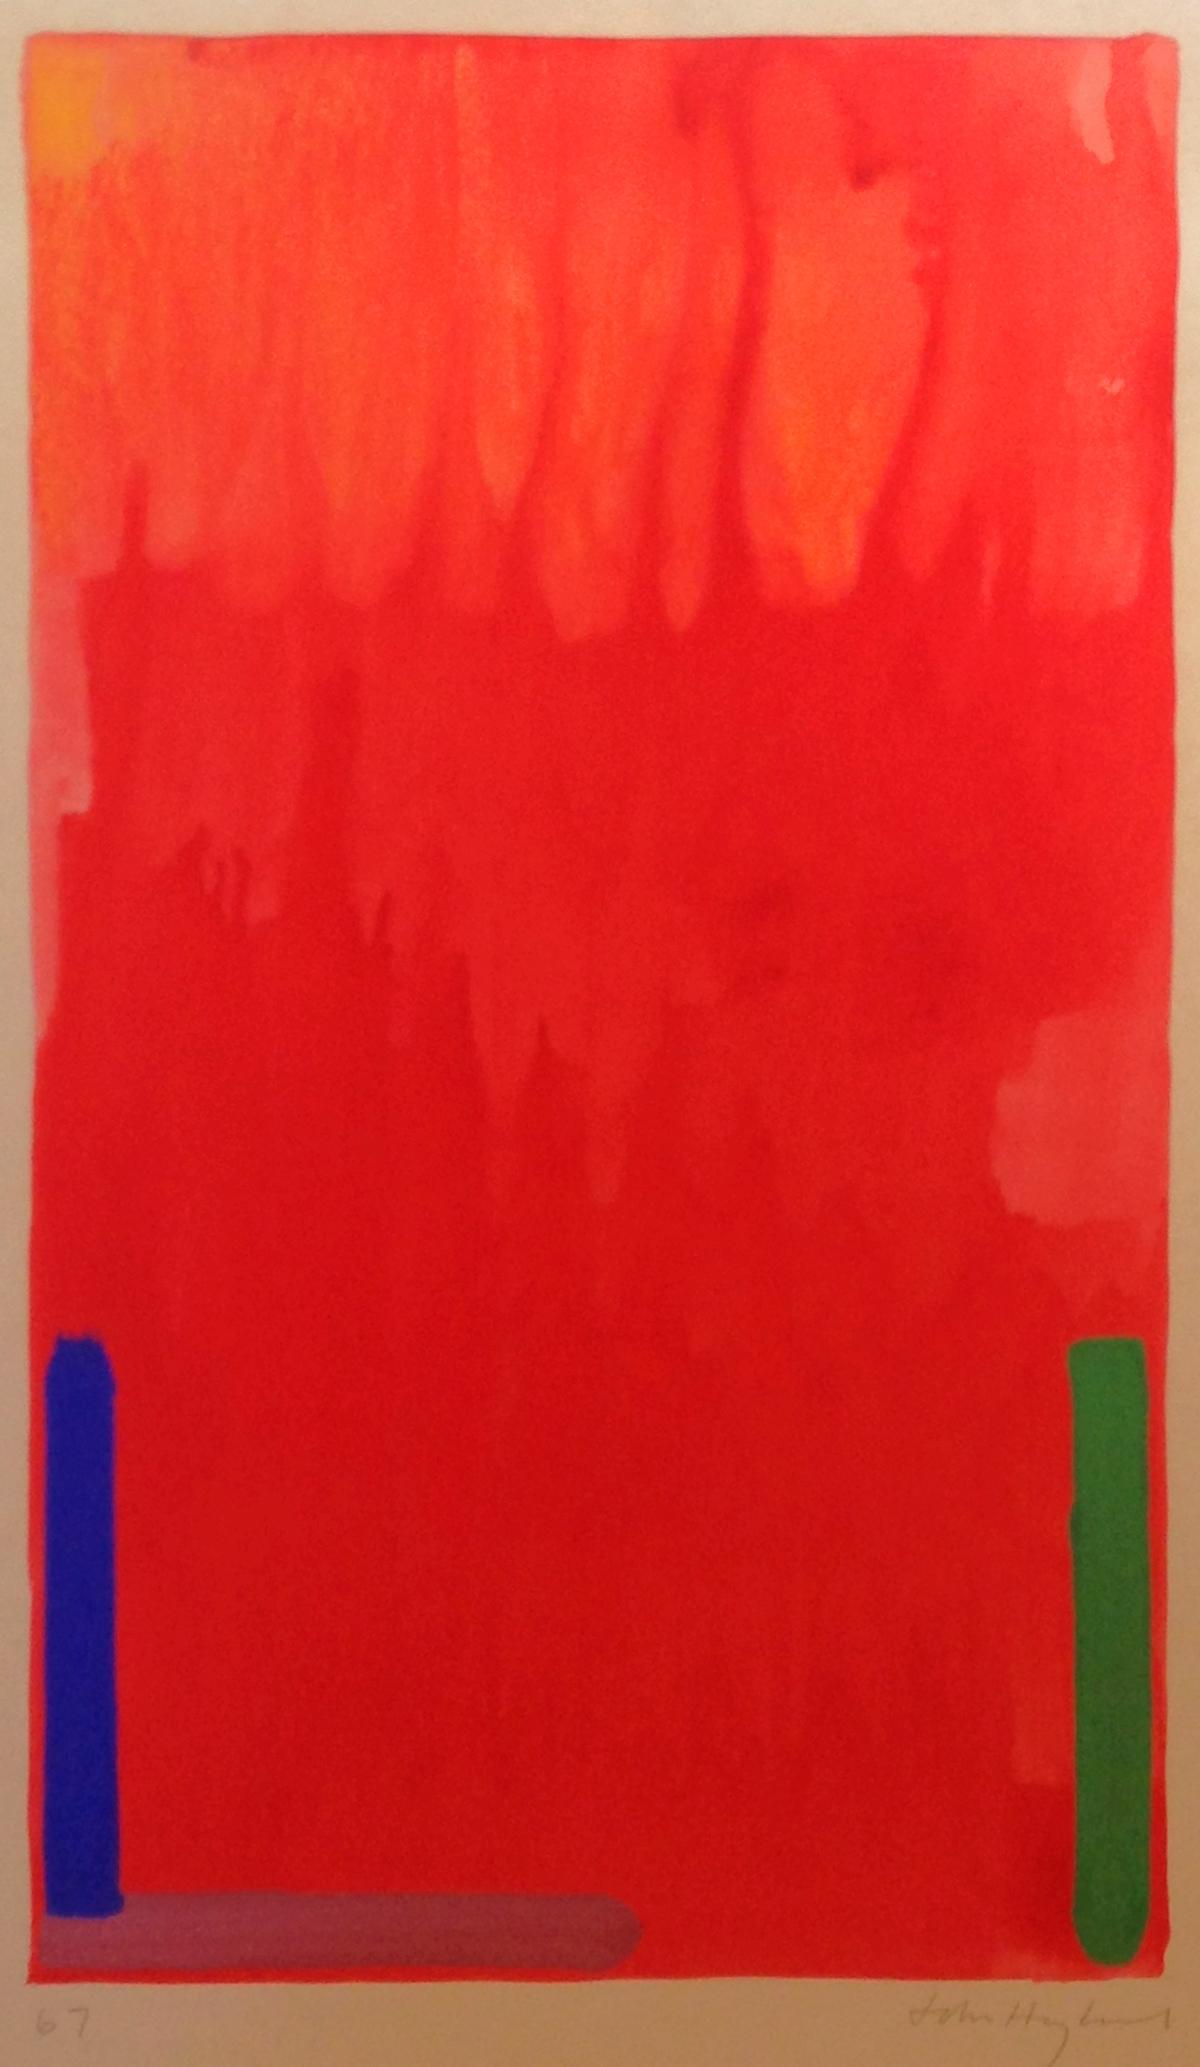 John Hoyland untitled, 1967 watercolor, 26 1/4 x 15 1/4